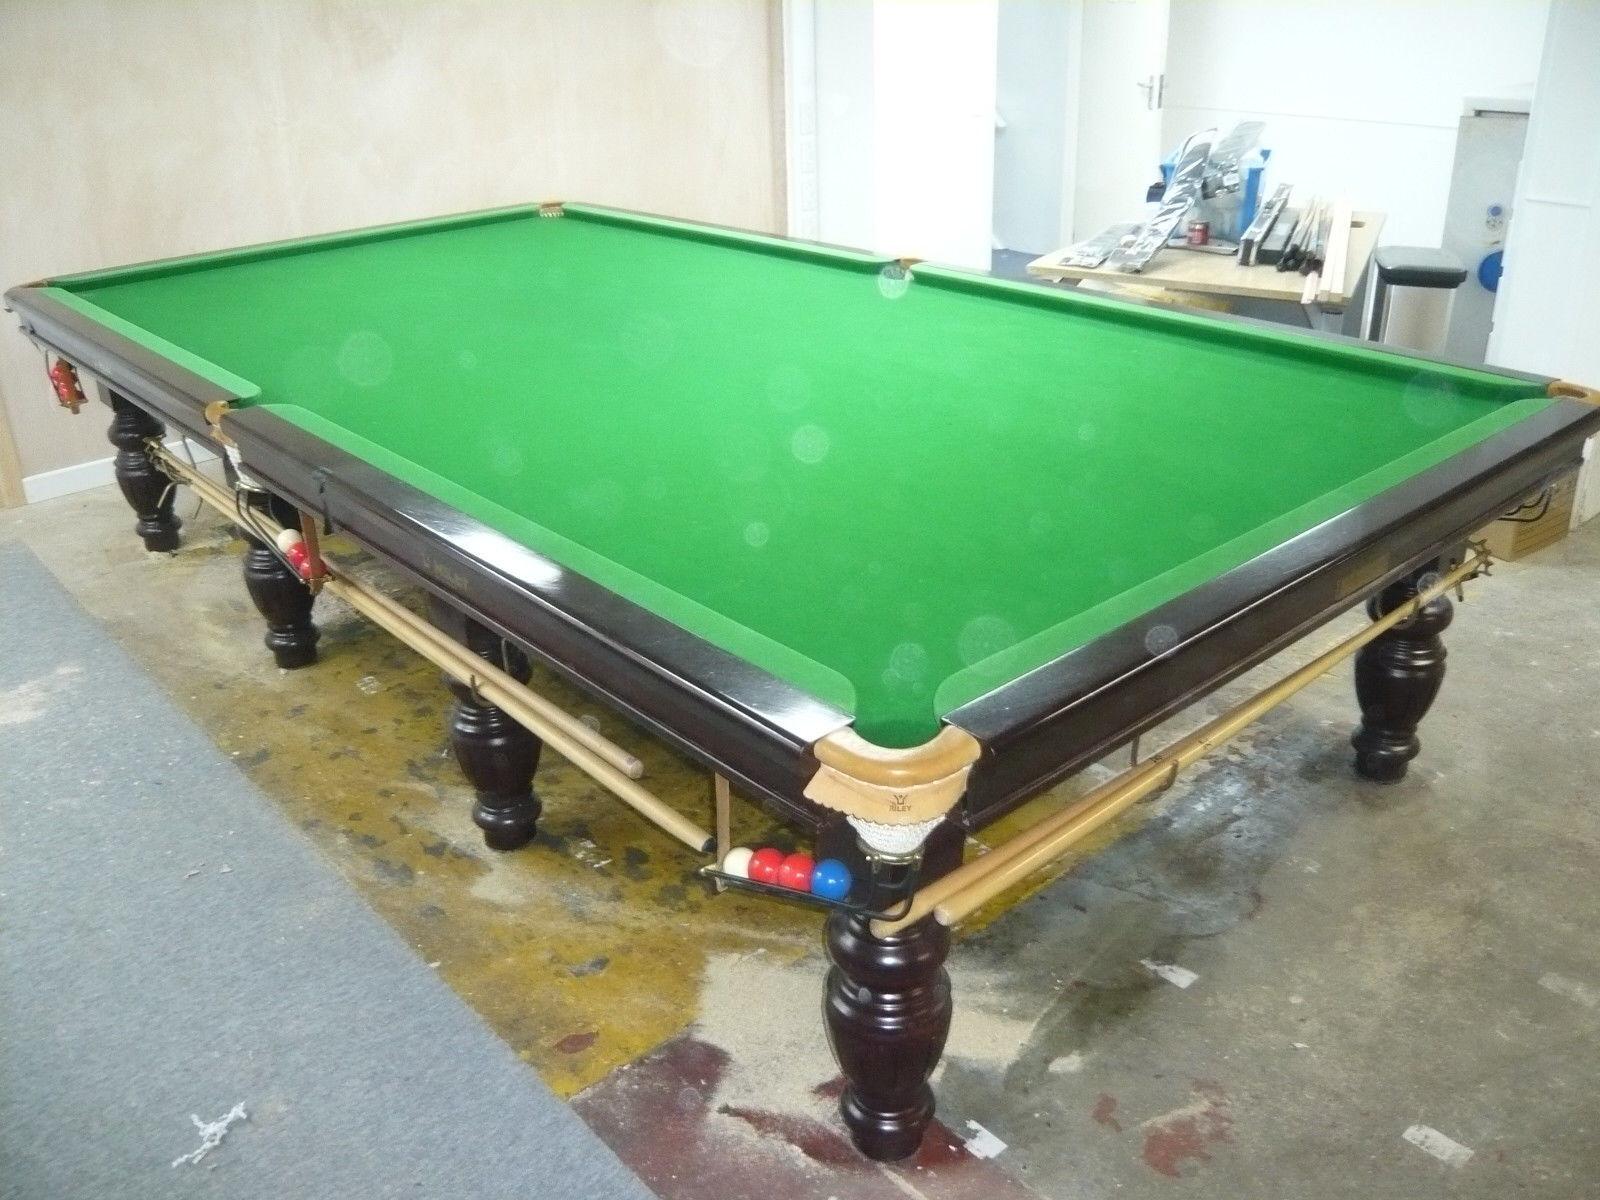 The1996 British Final Snooker Championship Table Nigel Bond Riley Stephen Hendry